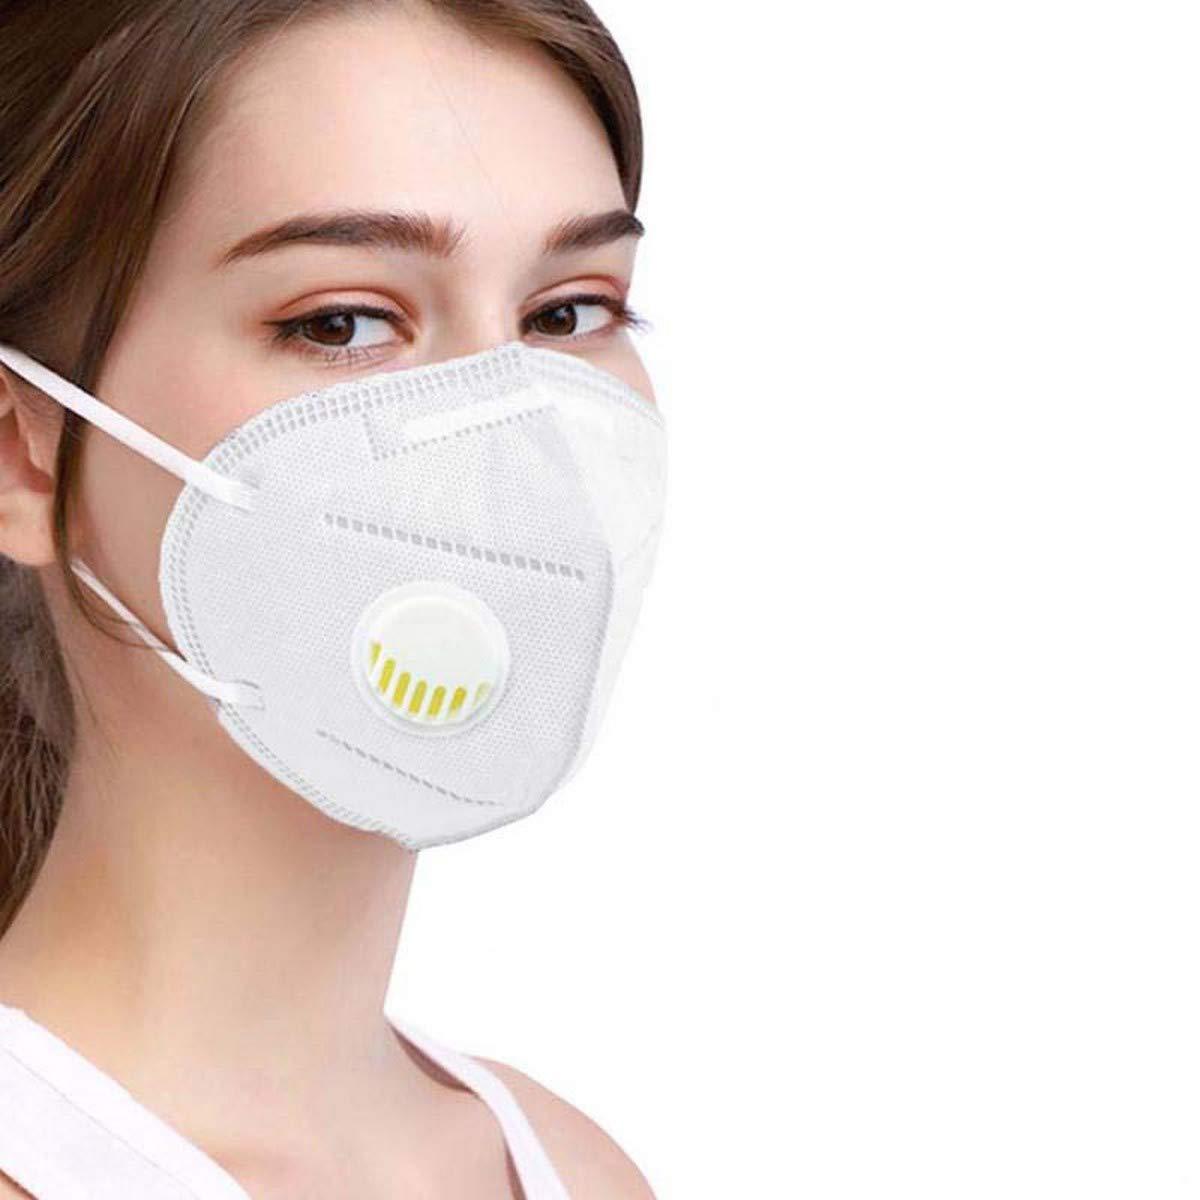 Top 5 premium international standard face masks n95 respirator face mask